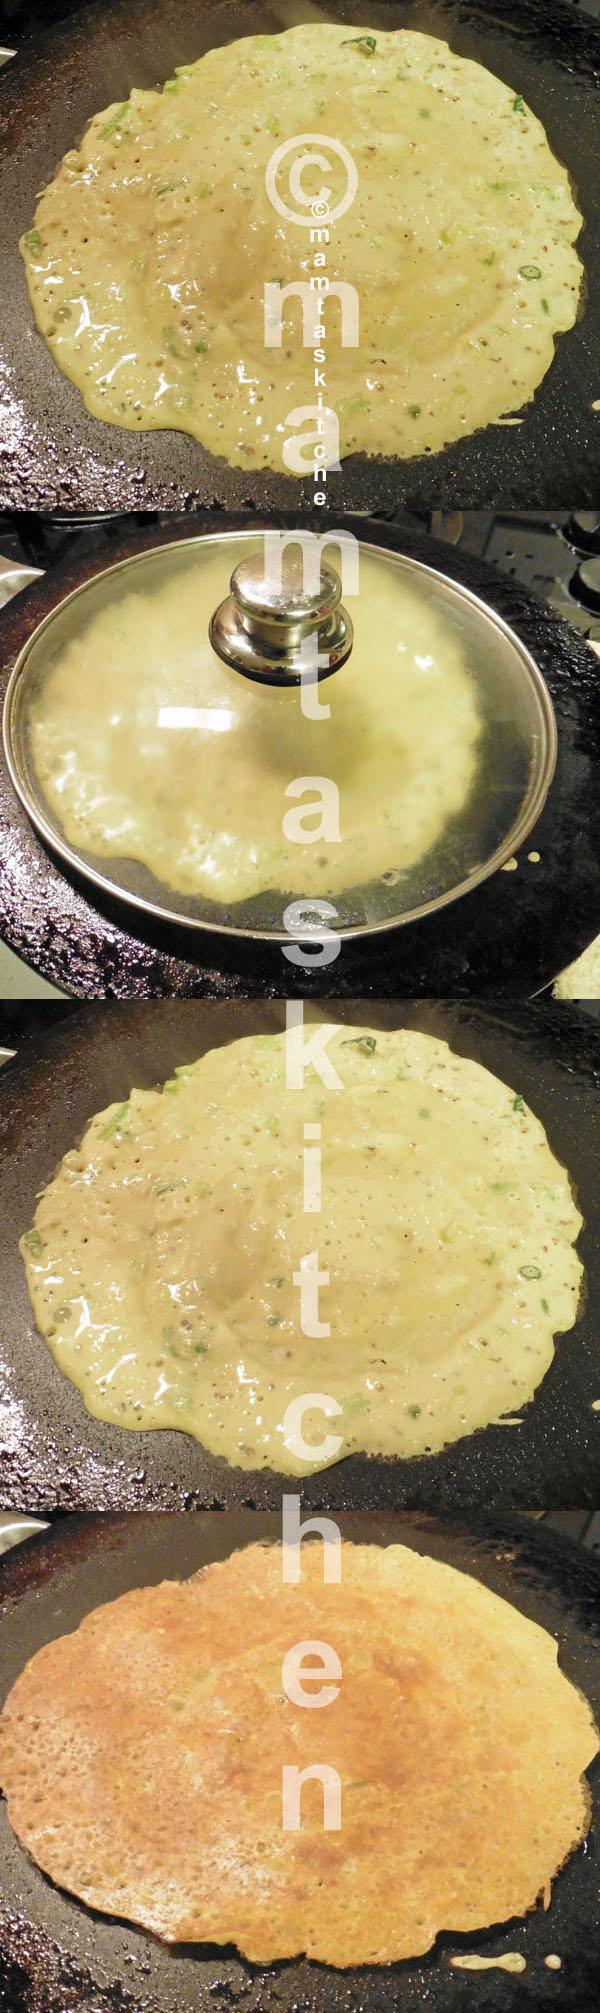 Besan (Gram Flour), Semolina, Potato And Onion Chilla Pancakes (Savoury & Vegan & Gluten Free)